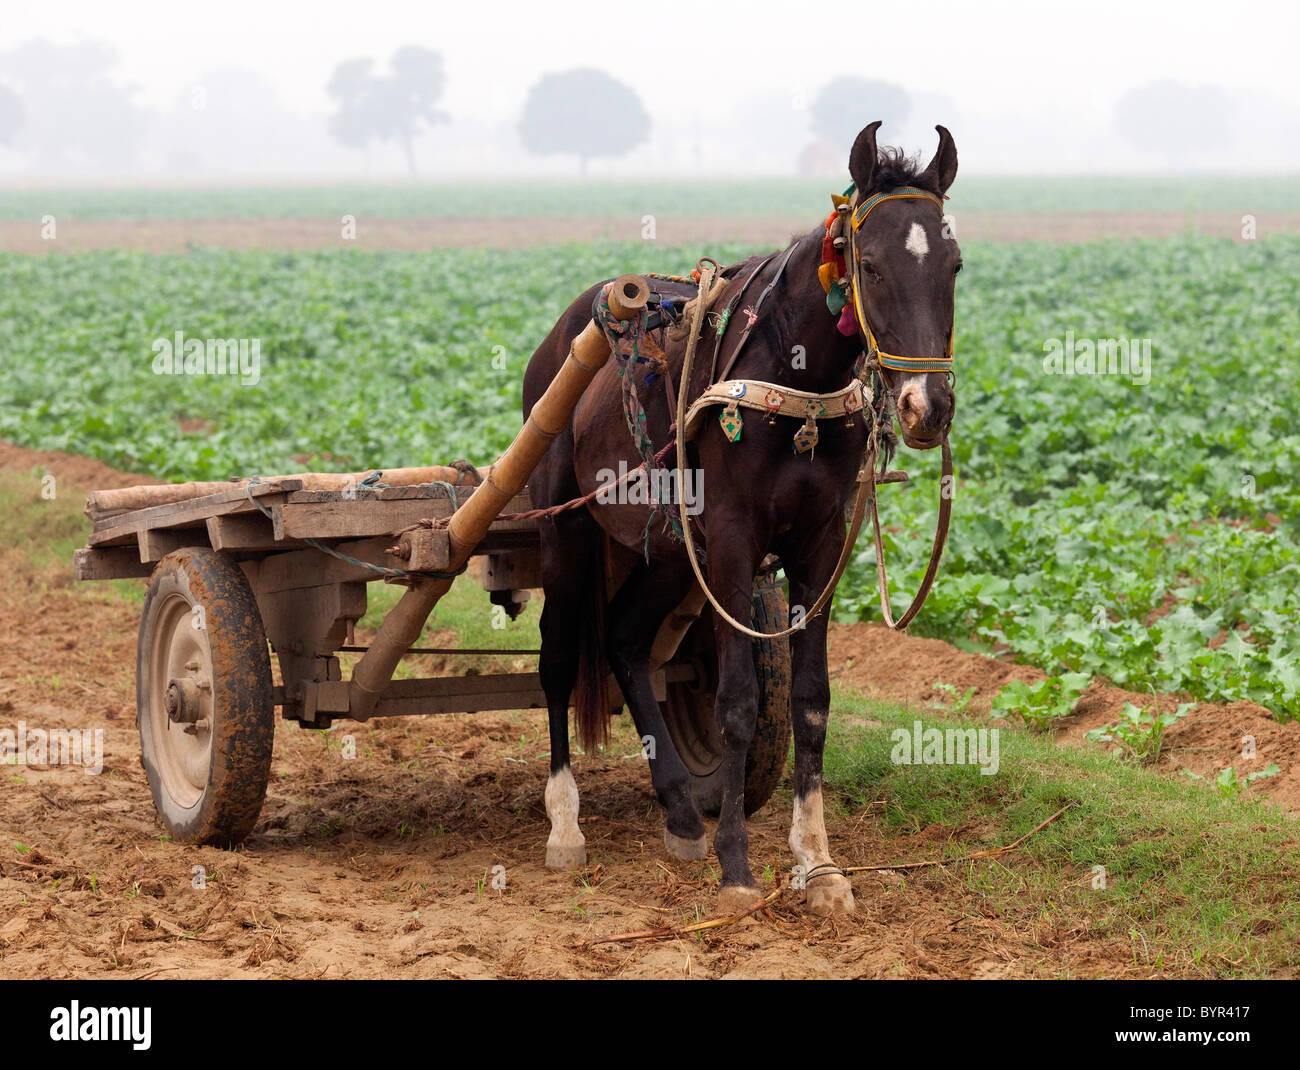 india, Uttar Pradesh, horse and cart in crop field in november - Stock Image